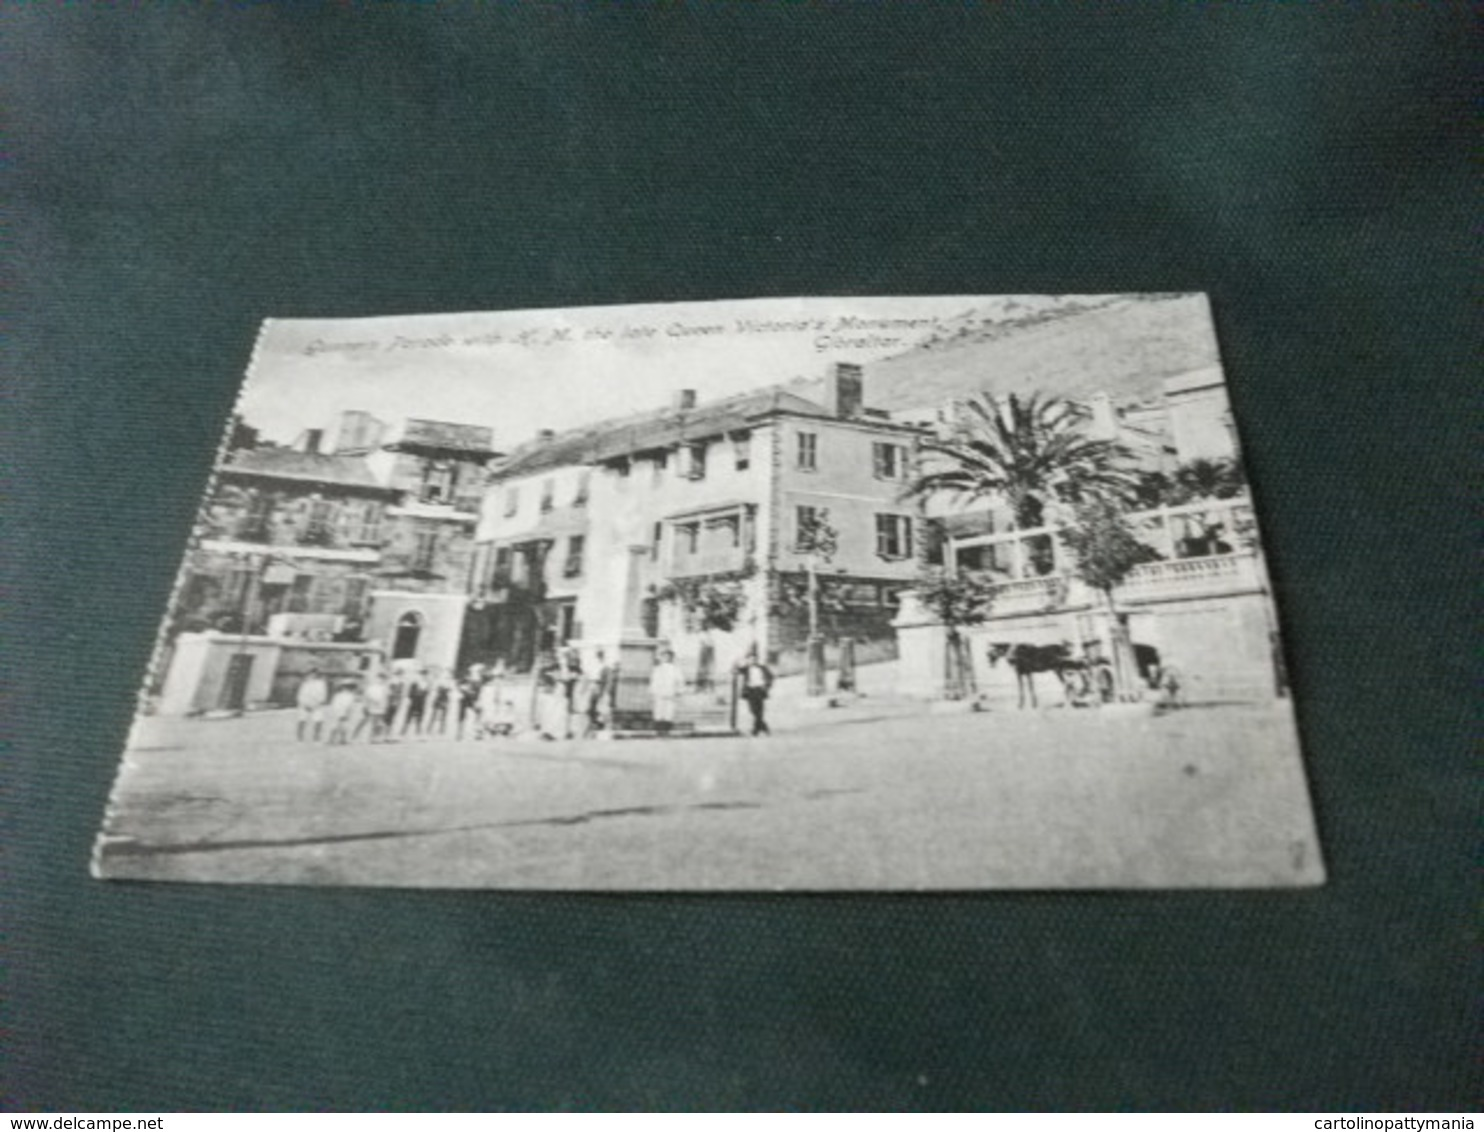 GUNNERS PARADE WITH H. M. THE LATE QUEEN VICTORIA'S MONUMENT GIBRALTAR MOVIMENTATA PICCOLO FORMATO - Gibilterra